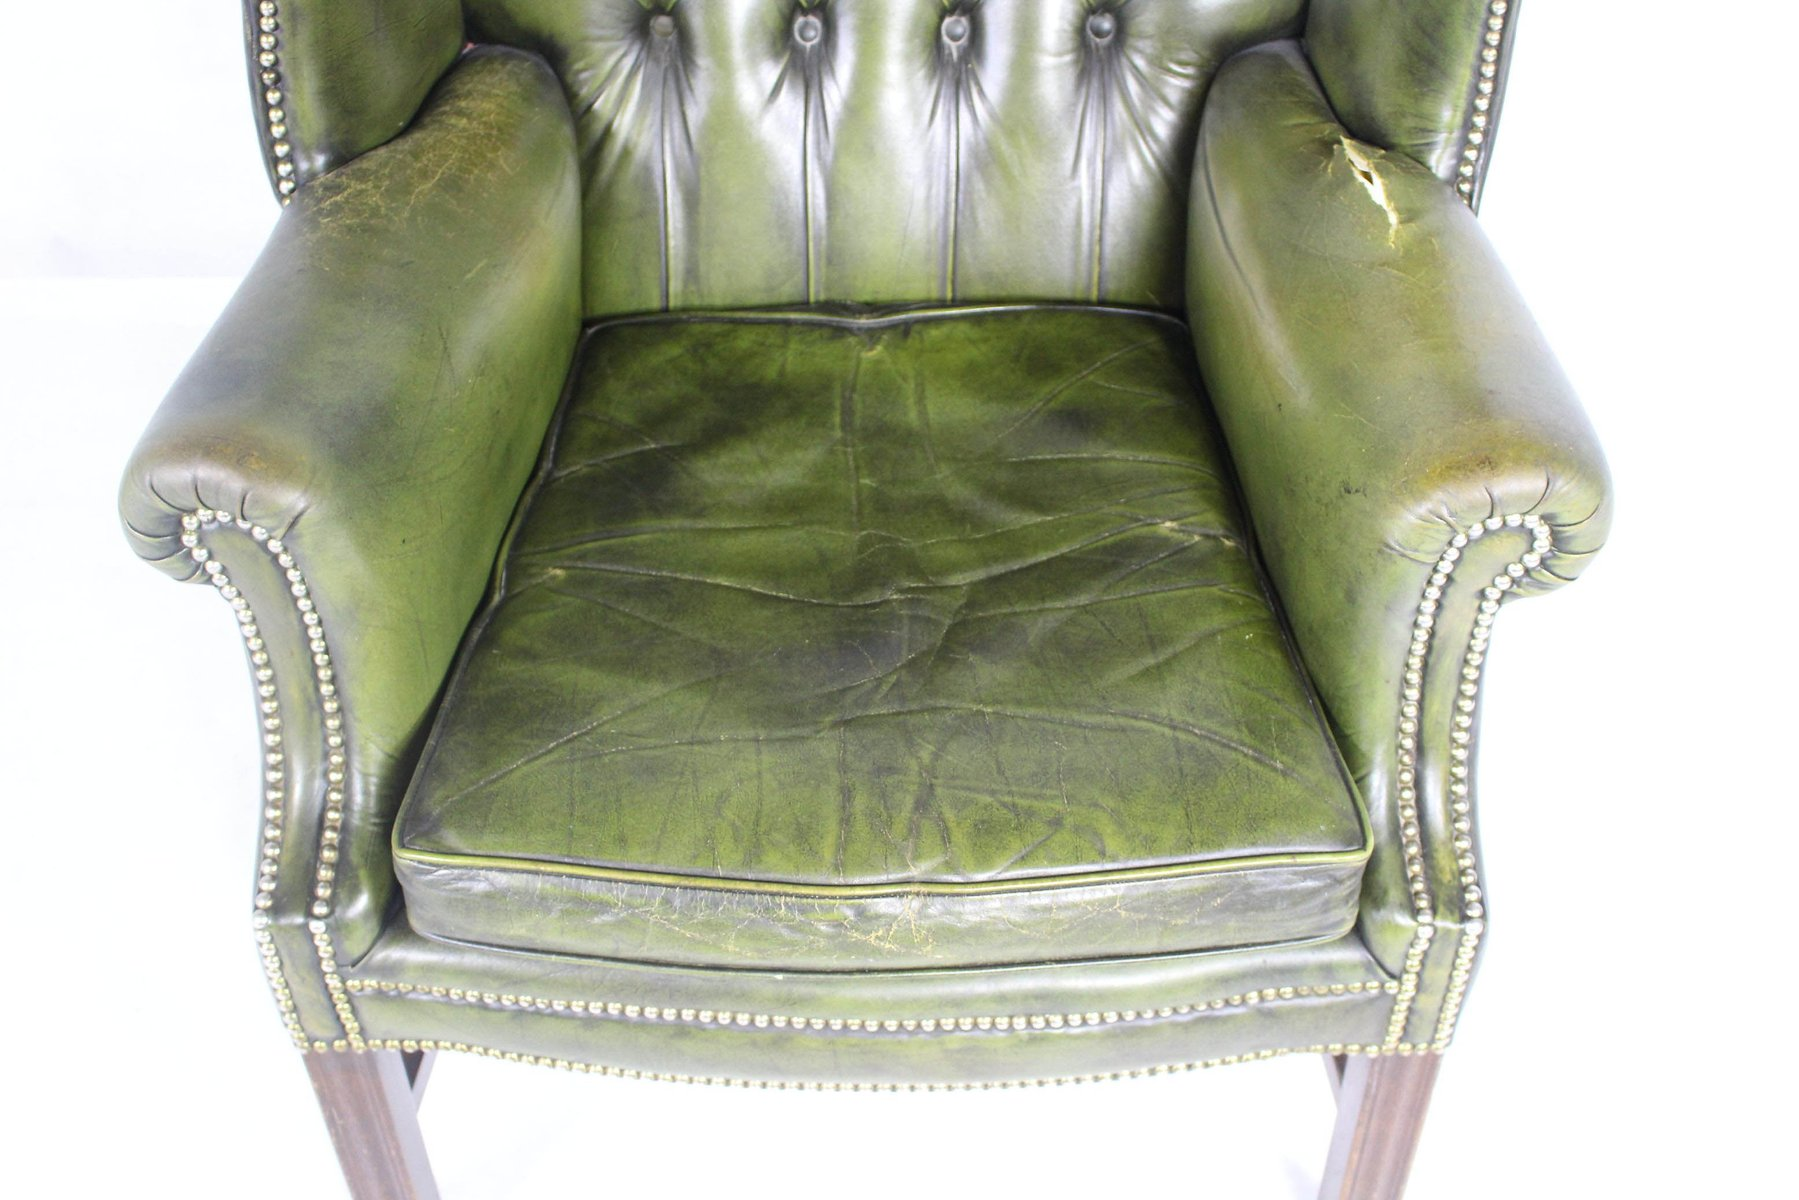 genieteter vintage leder ohrensessel bei pamono kaufen. Black Bedroom Furniture Sets. Home Design Ideas